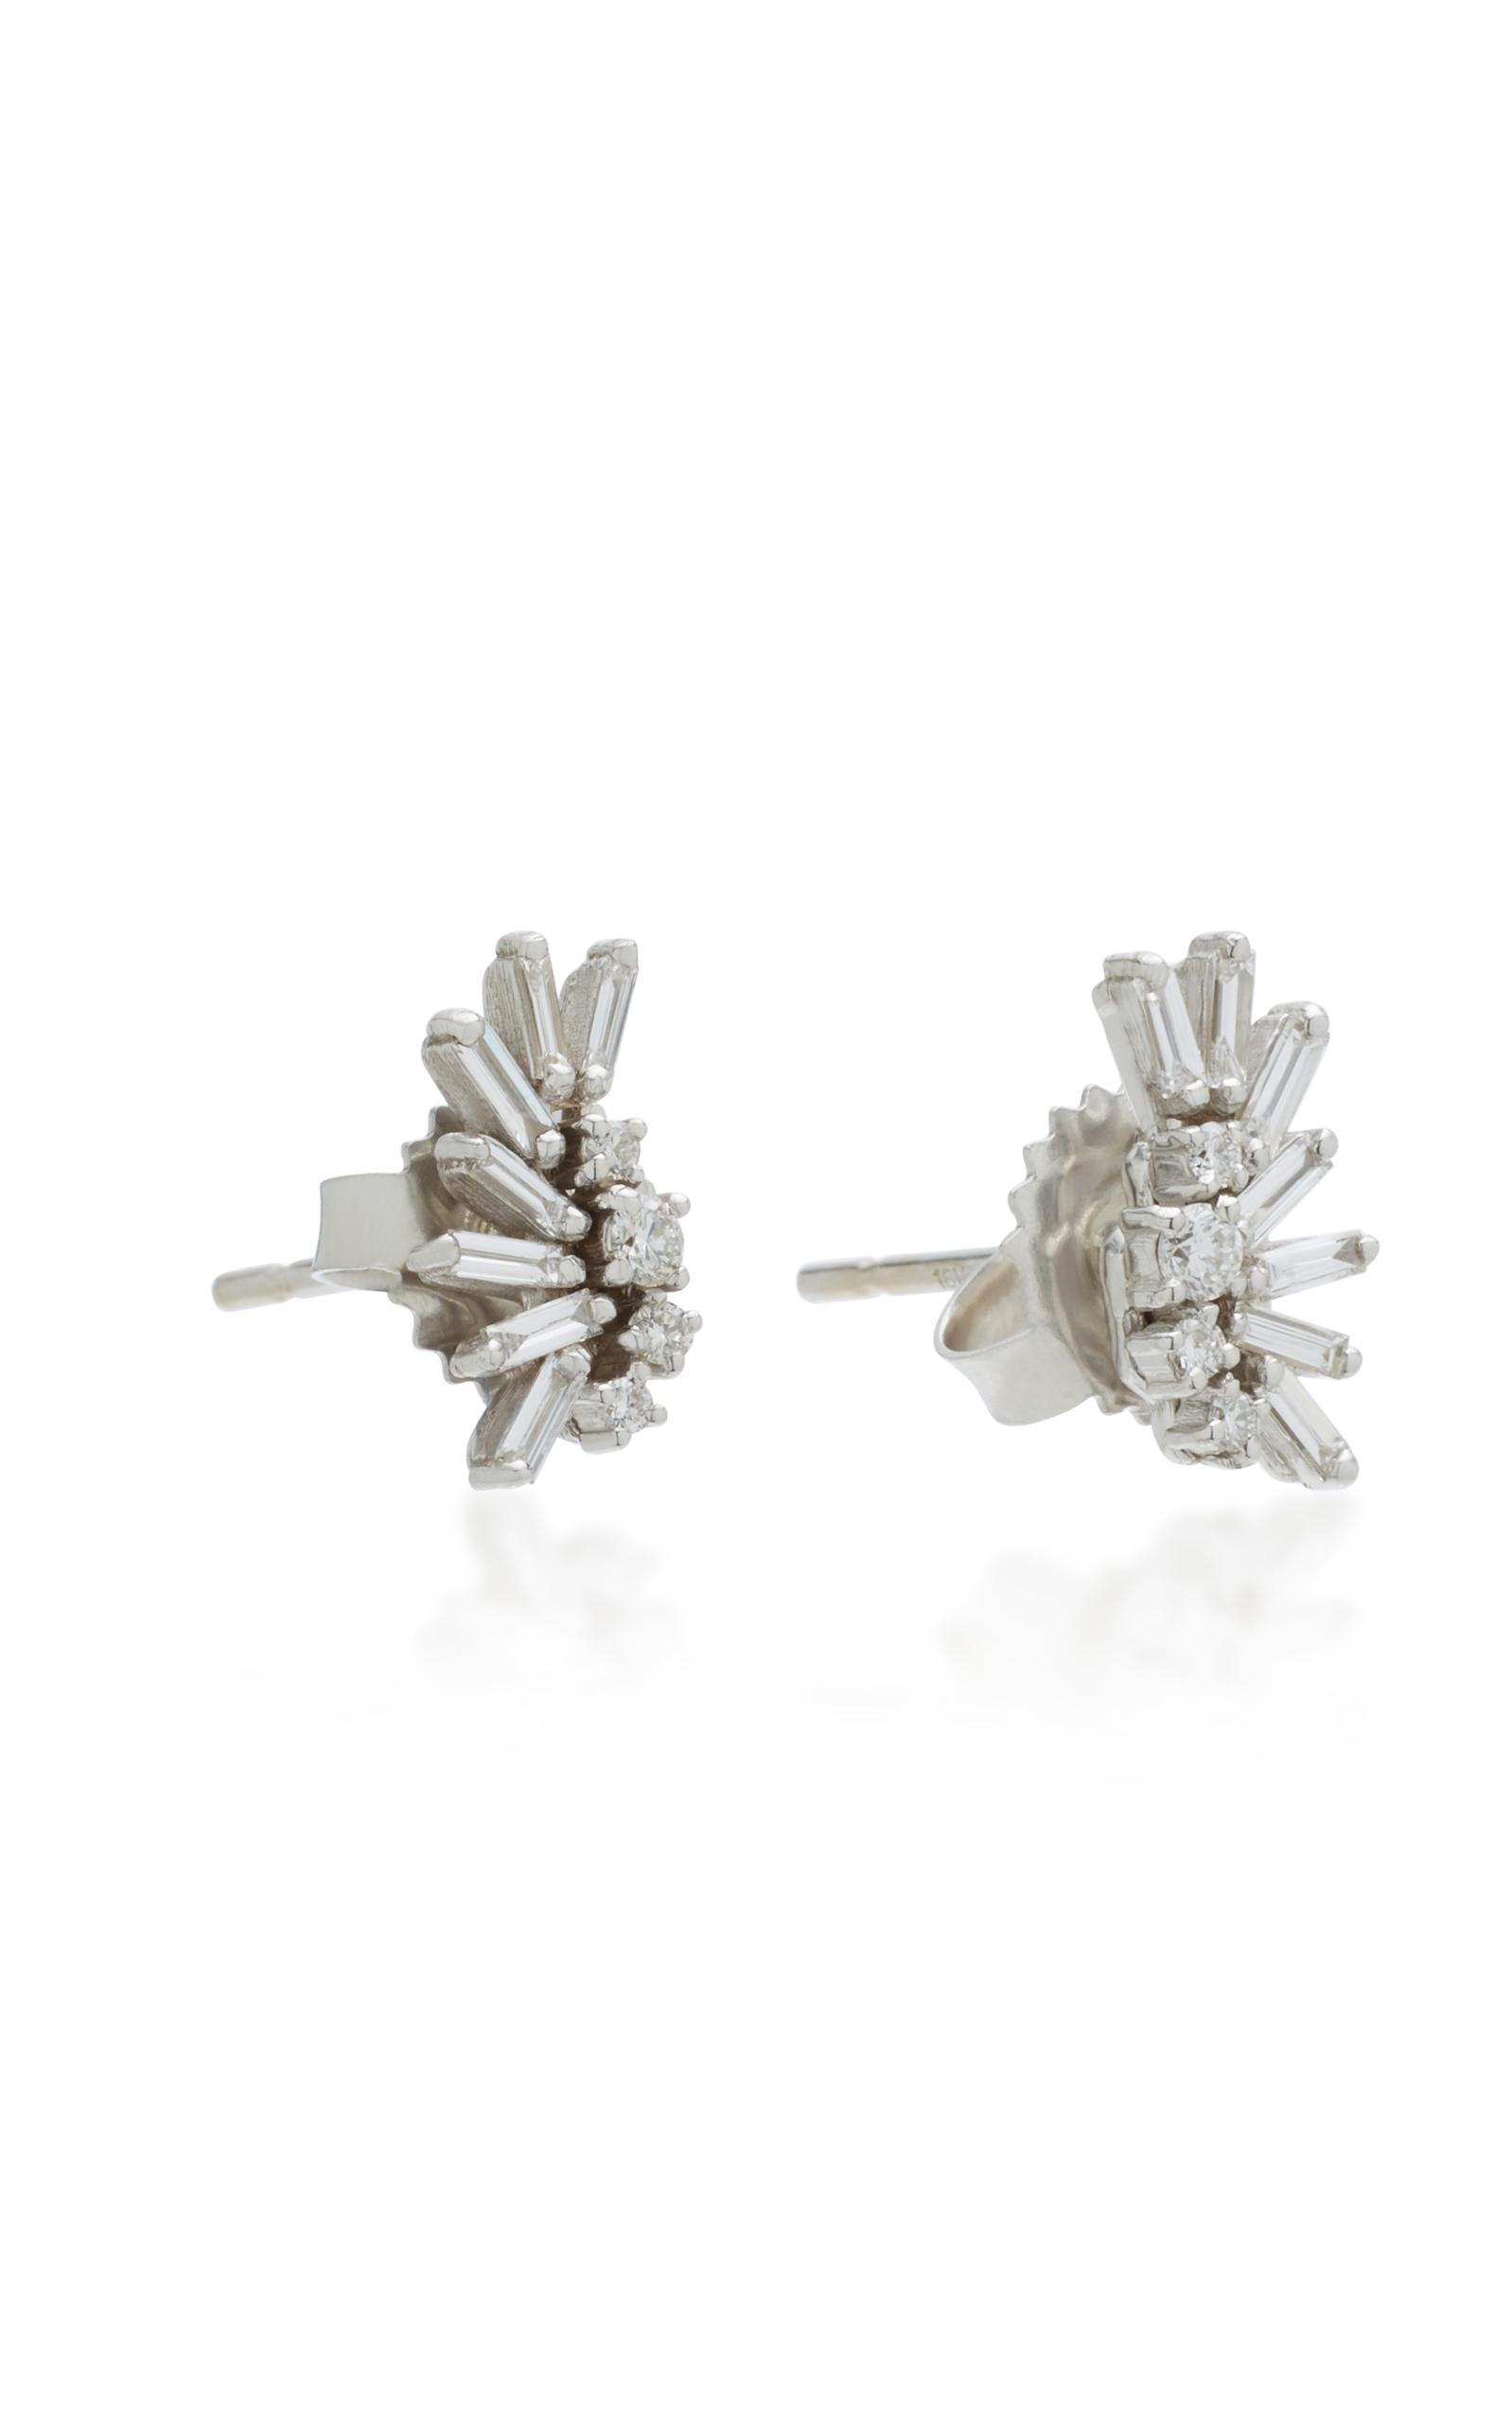 18K White Gold Diamond Earrings Suzanne Kalan spQEl4